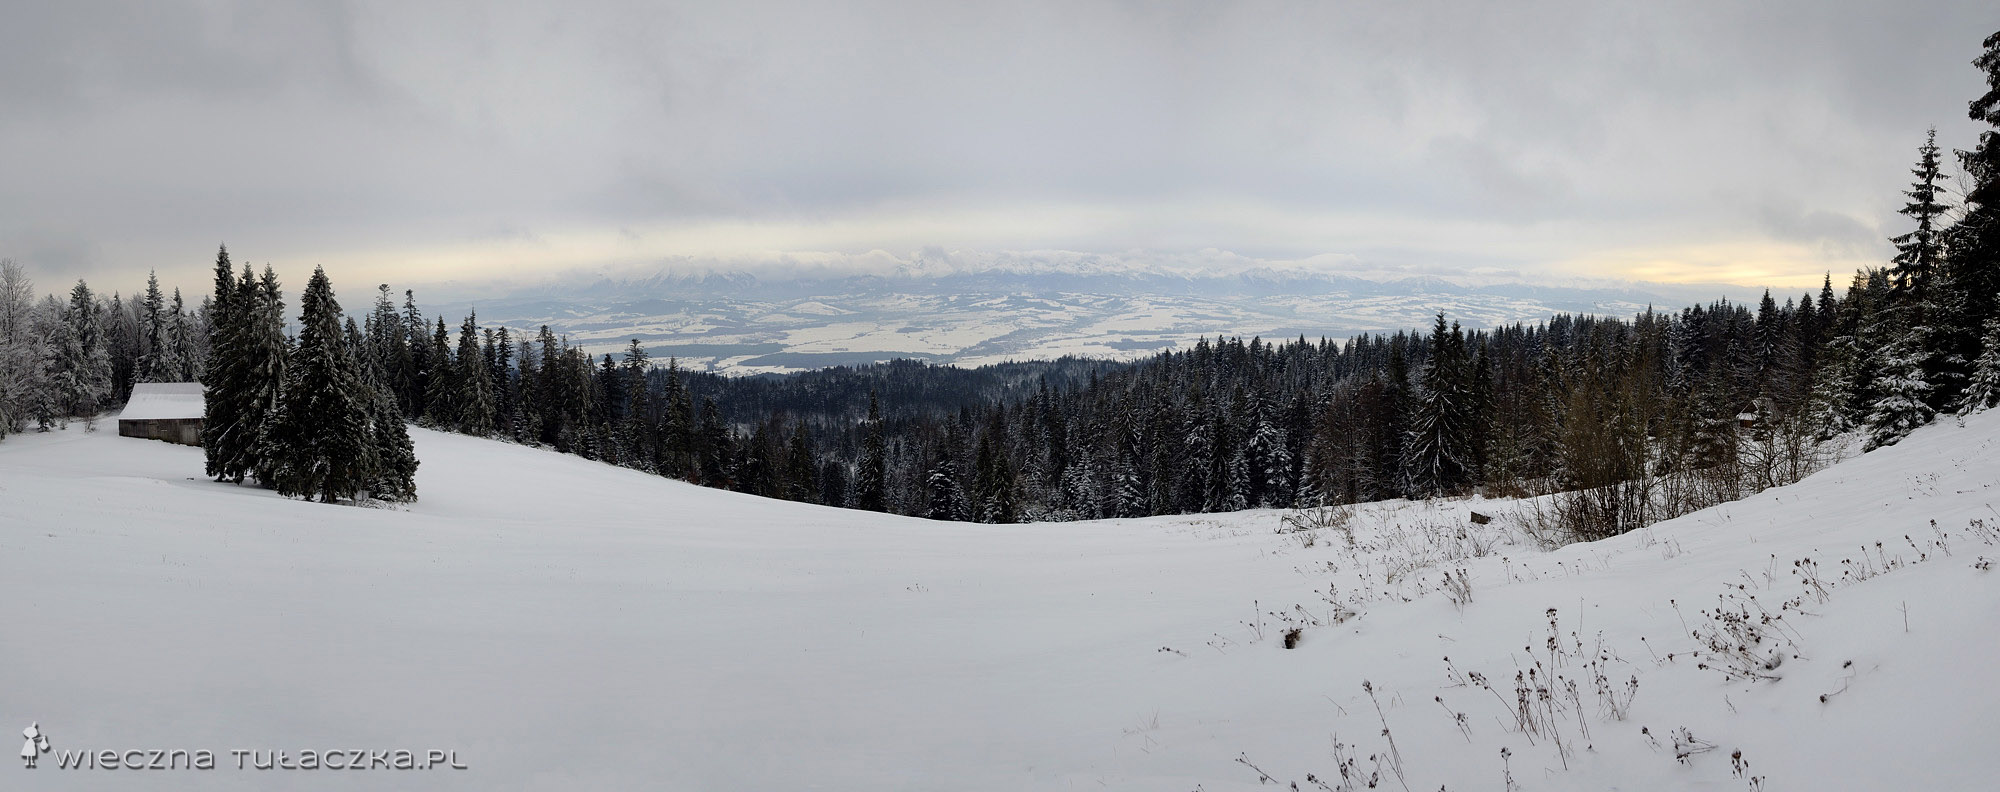 Bukowina Waksmundzka, Gorce